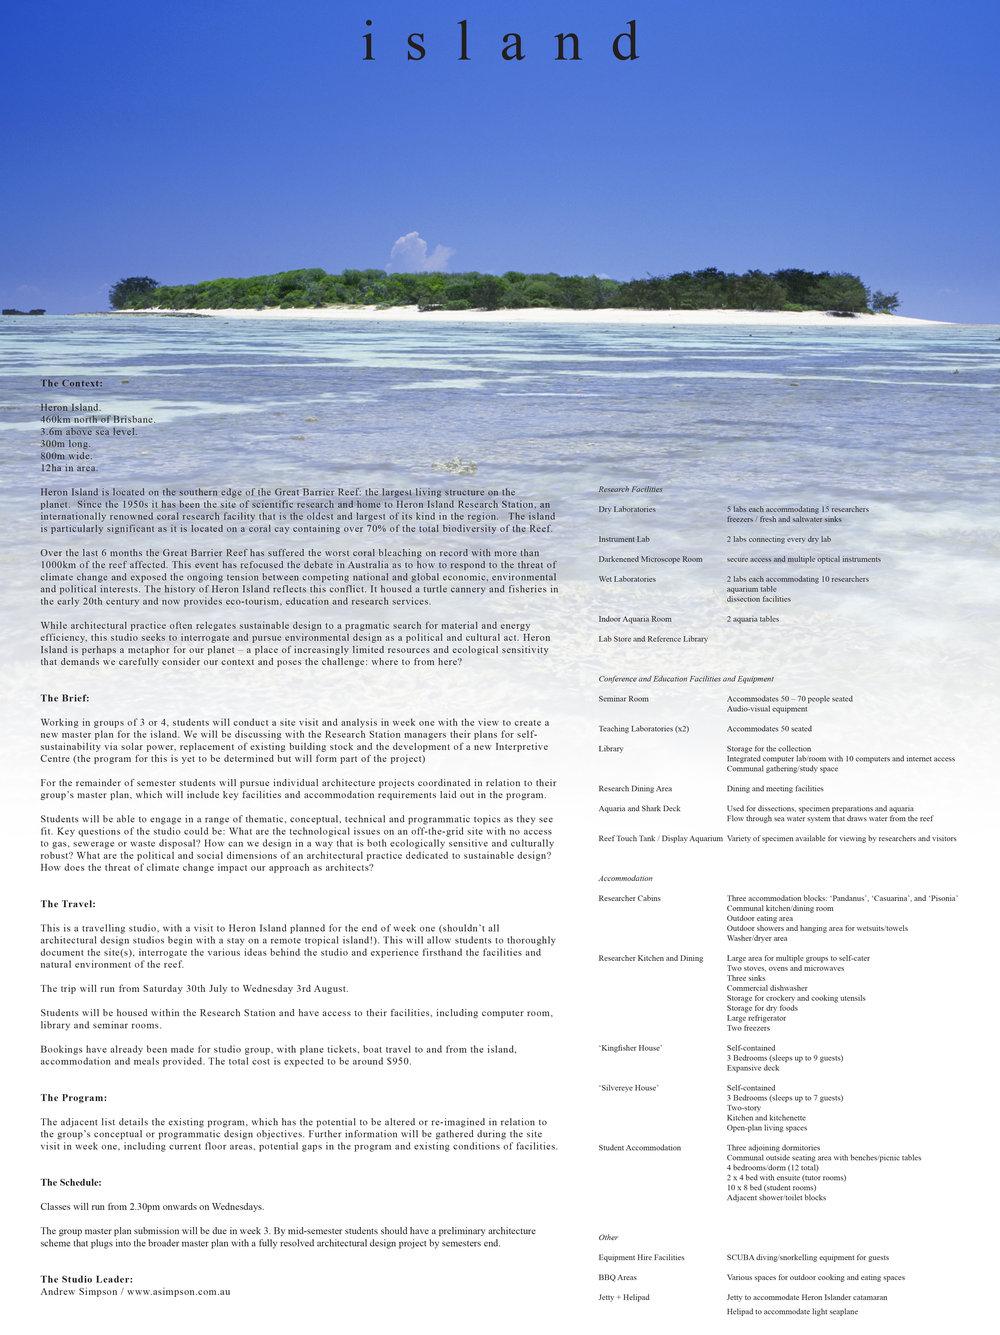 island - design studio poster.jpg